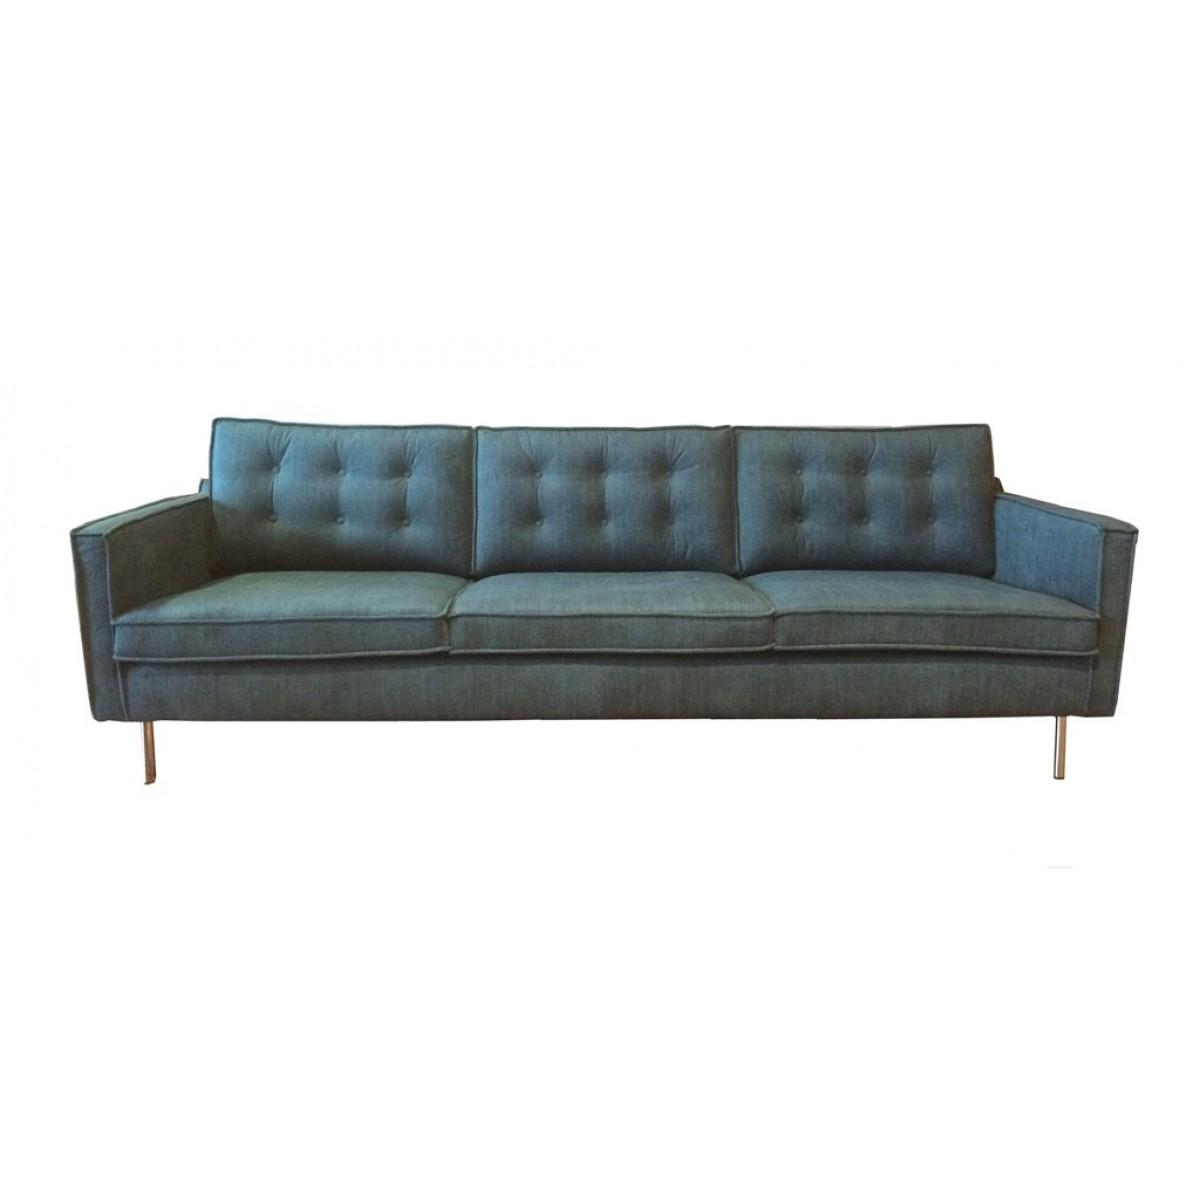 Wonderbaarlijk Malmö Sofa retro sofa | I Live Design Preisgünstig online Moebel KO-94